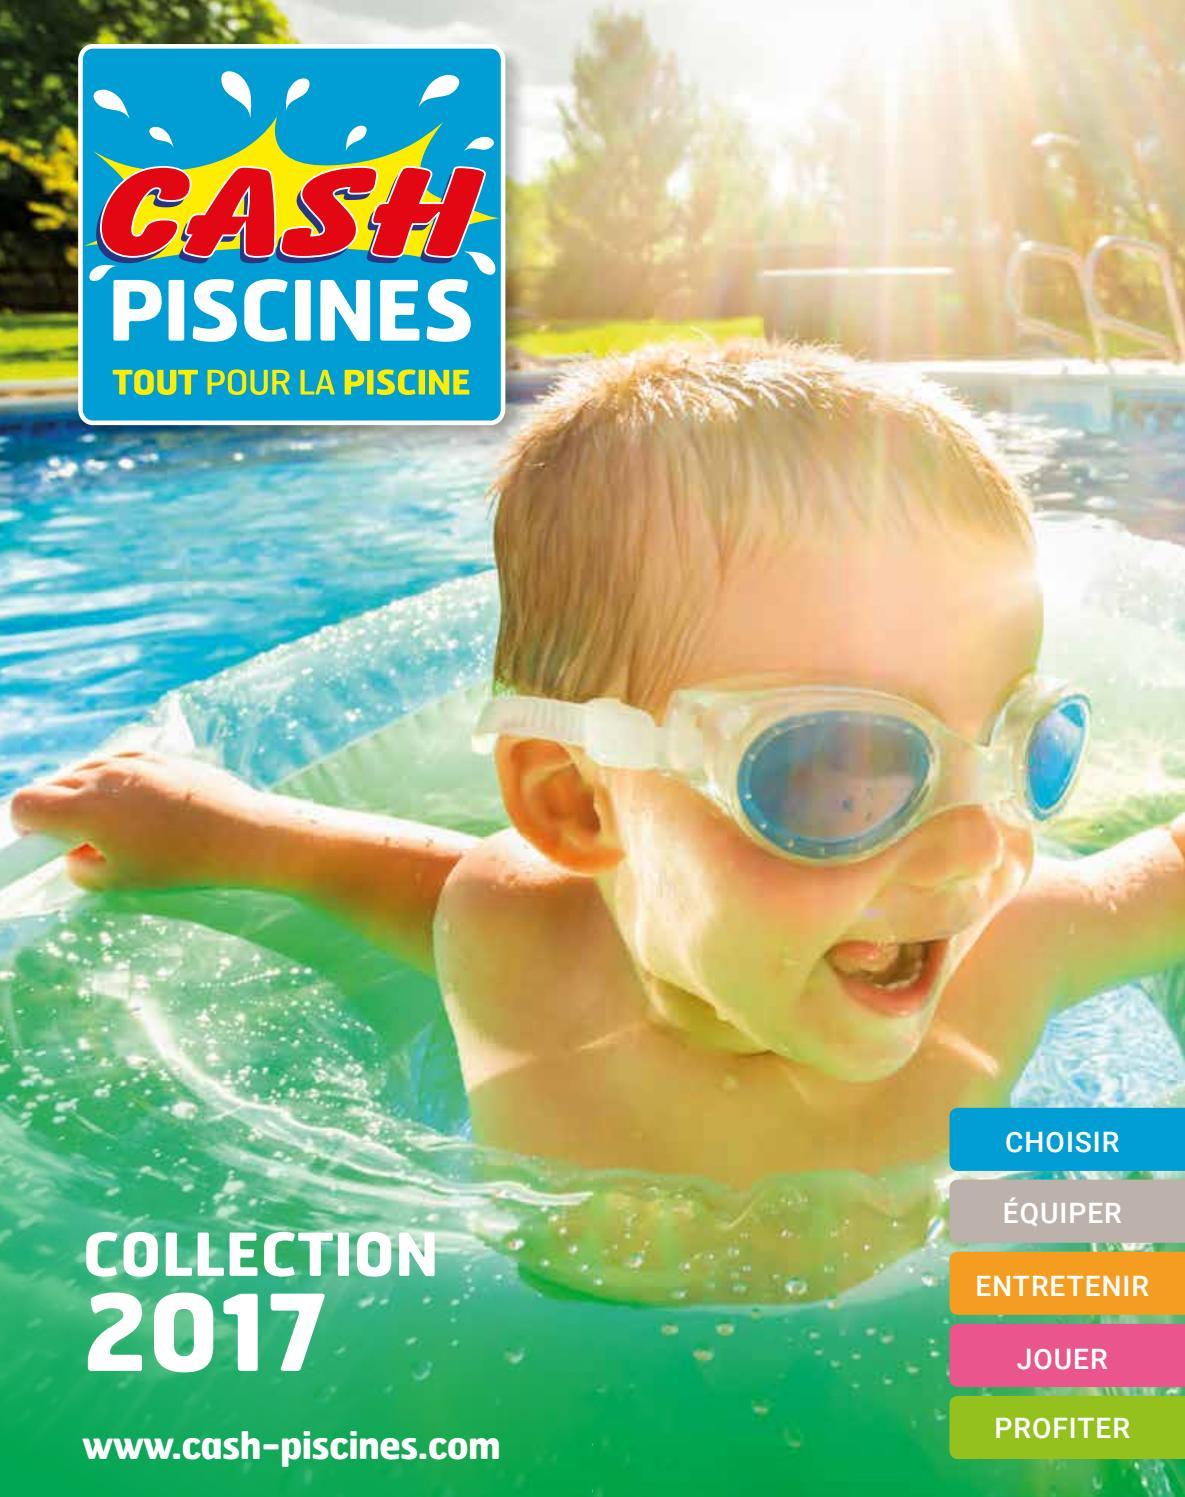 Catalogue Cash Piscine 2017 By Octave Octave - Issuu serapportantà Cash Piscine Brive